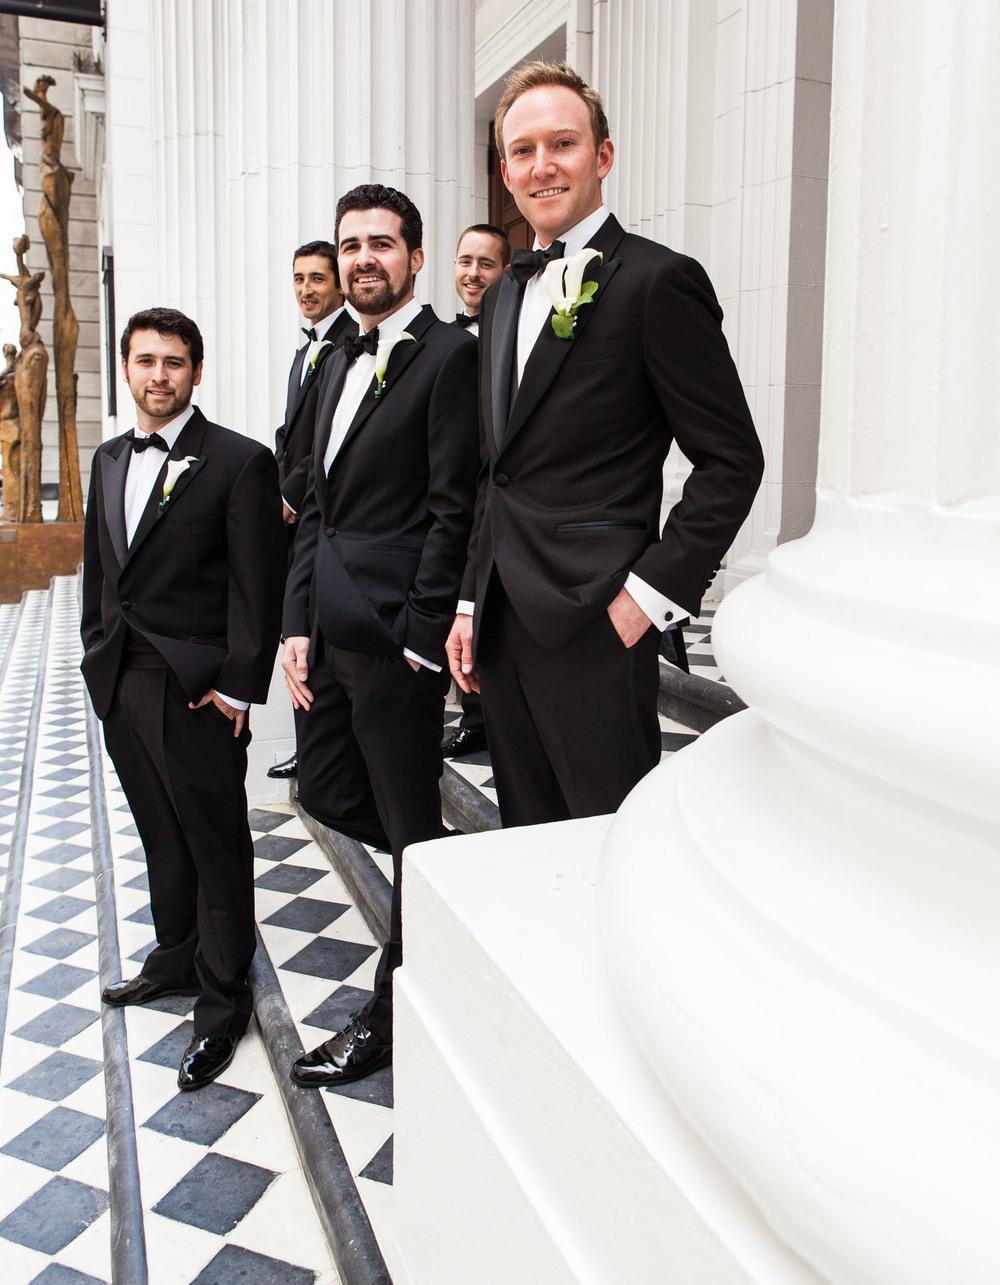 stewart_bertrand_wedding_photography_sp-1023.jpg